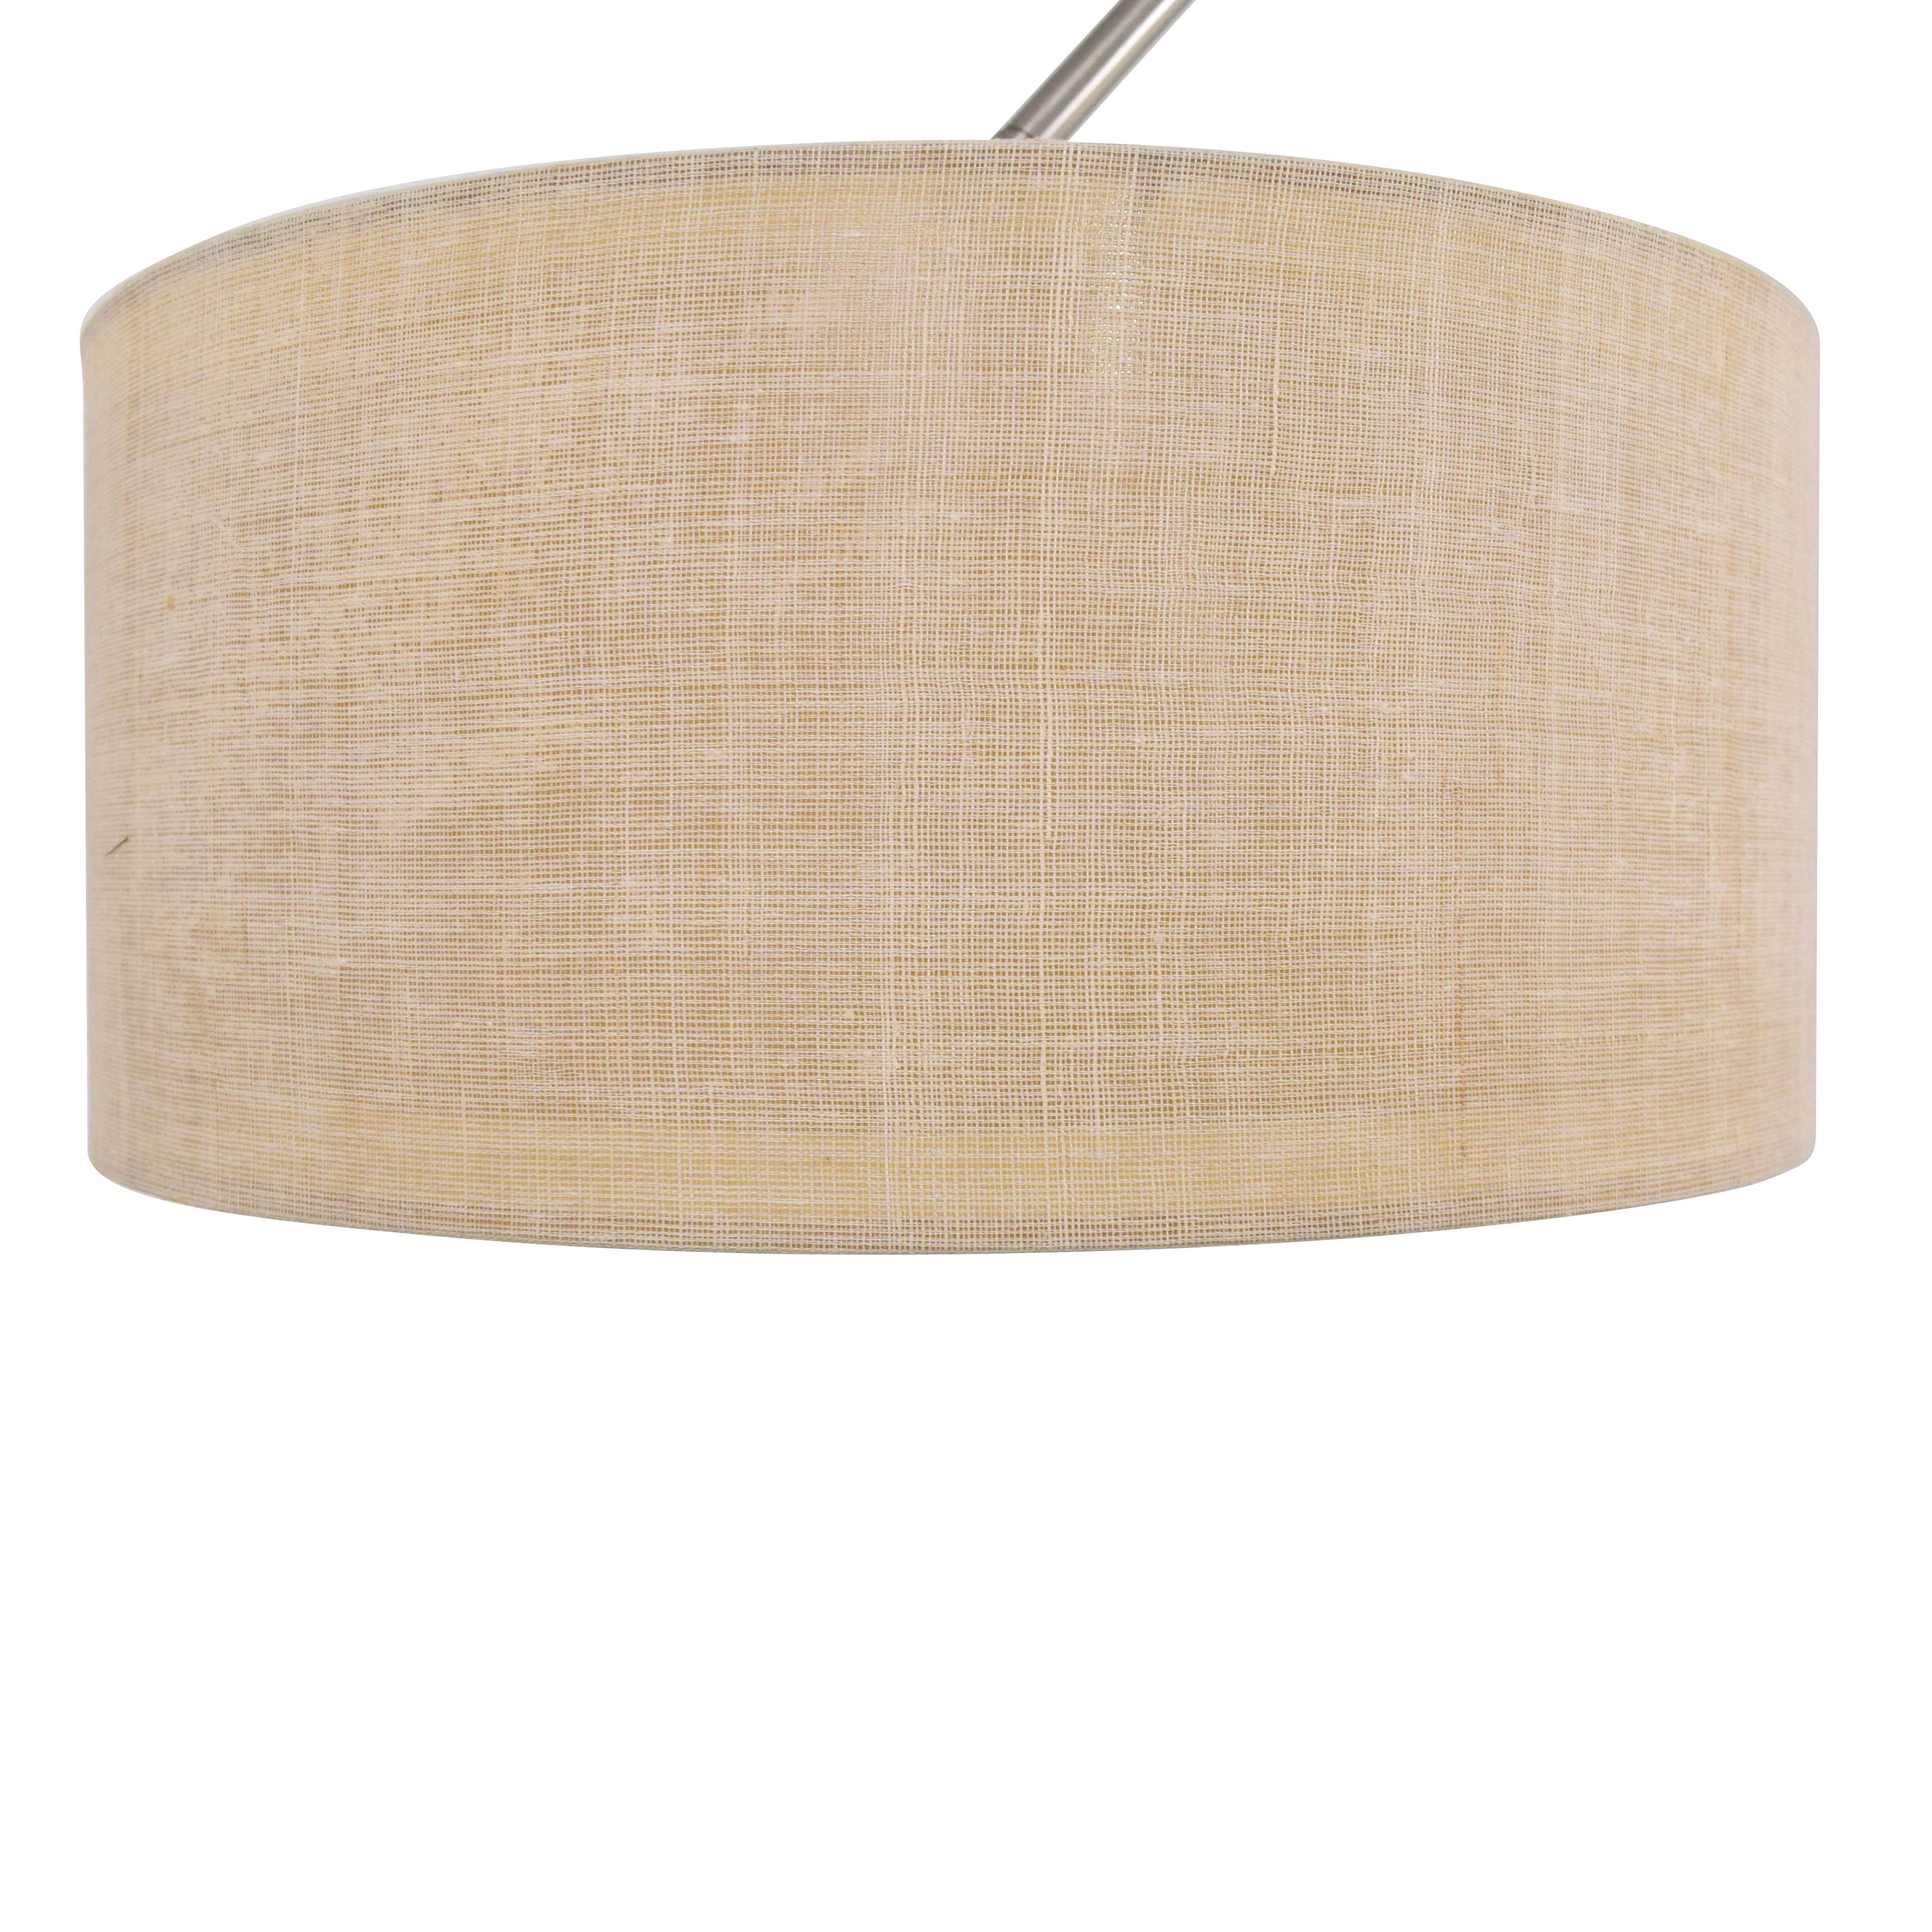 CB2 CB2 Big Dipper Arc Floor Lamp silver & beige